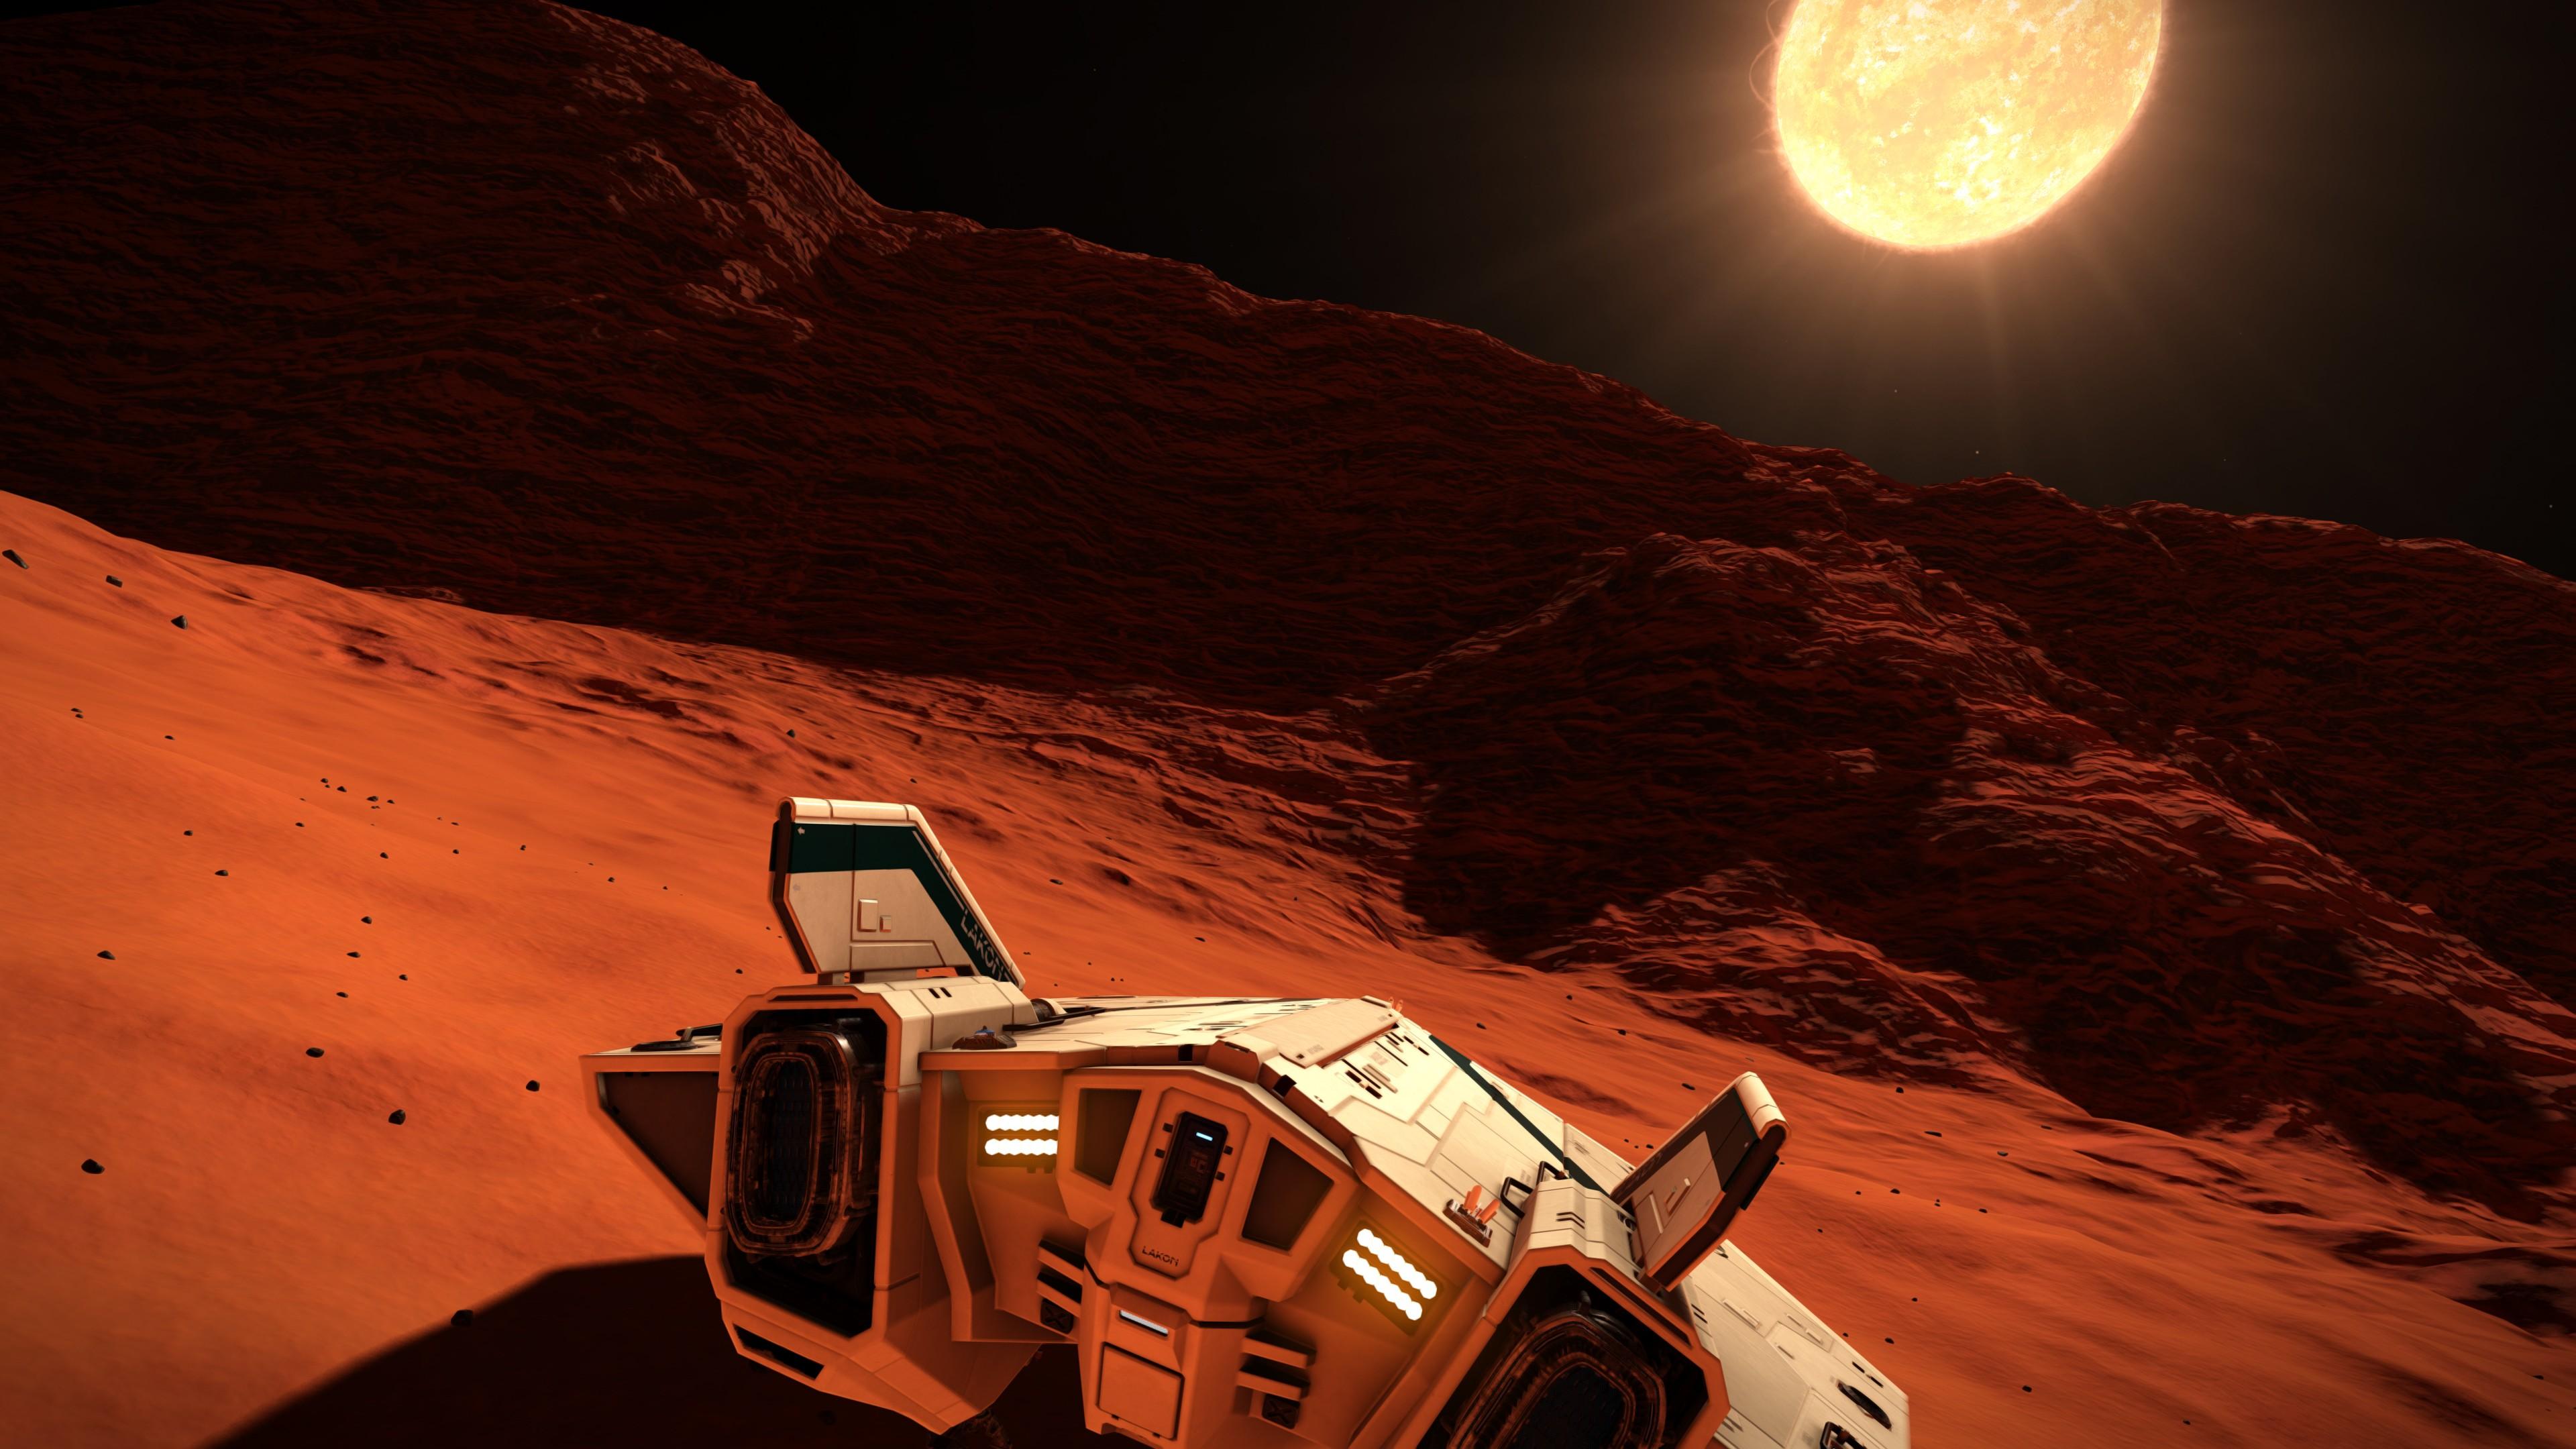 Wallpaper Elite Dangerous Horizons Best Games Sci Fi Space Open World Game PC PS4 Xbox